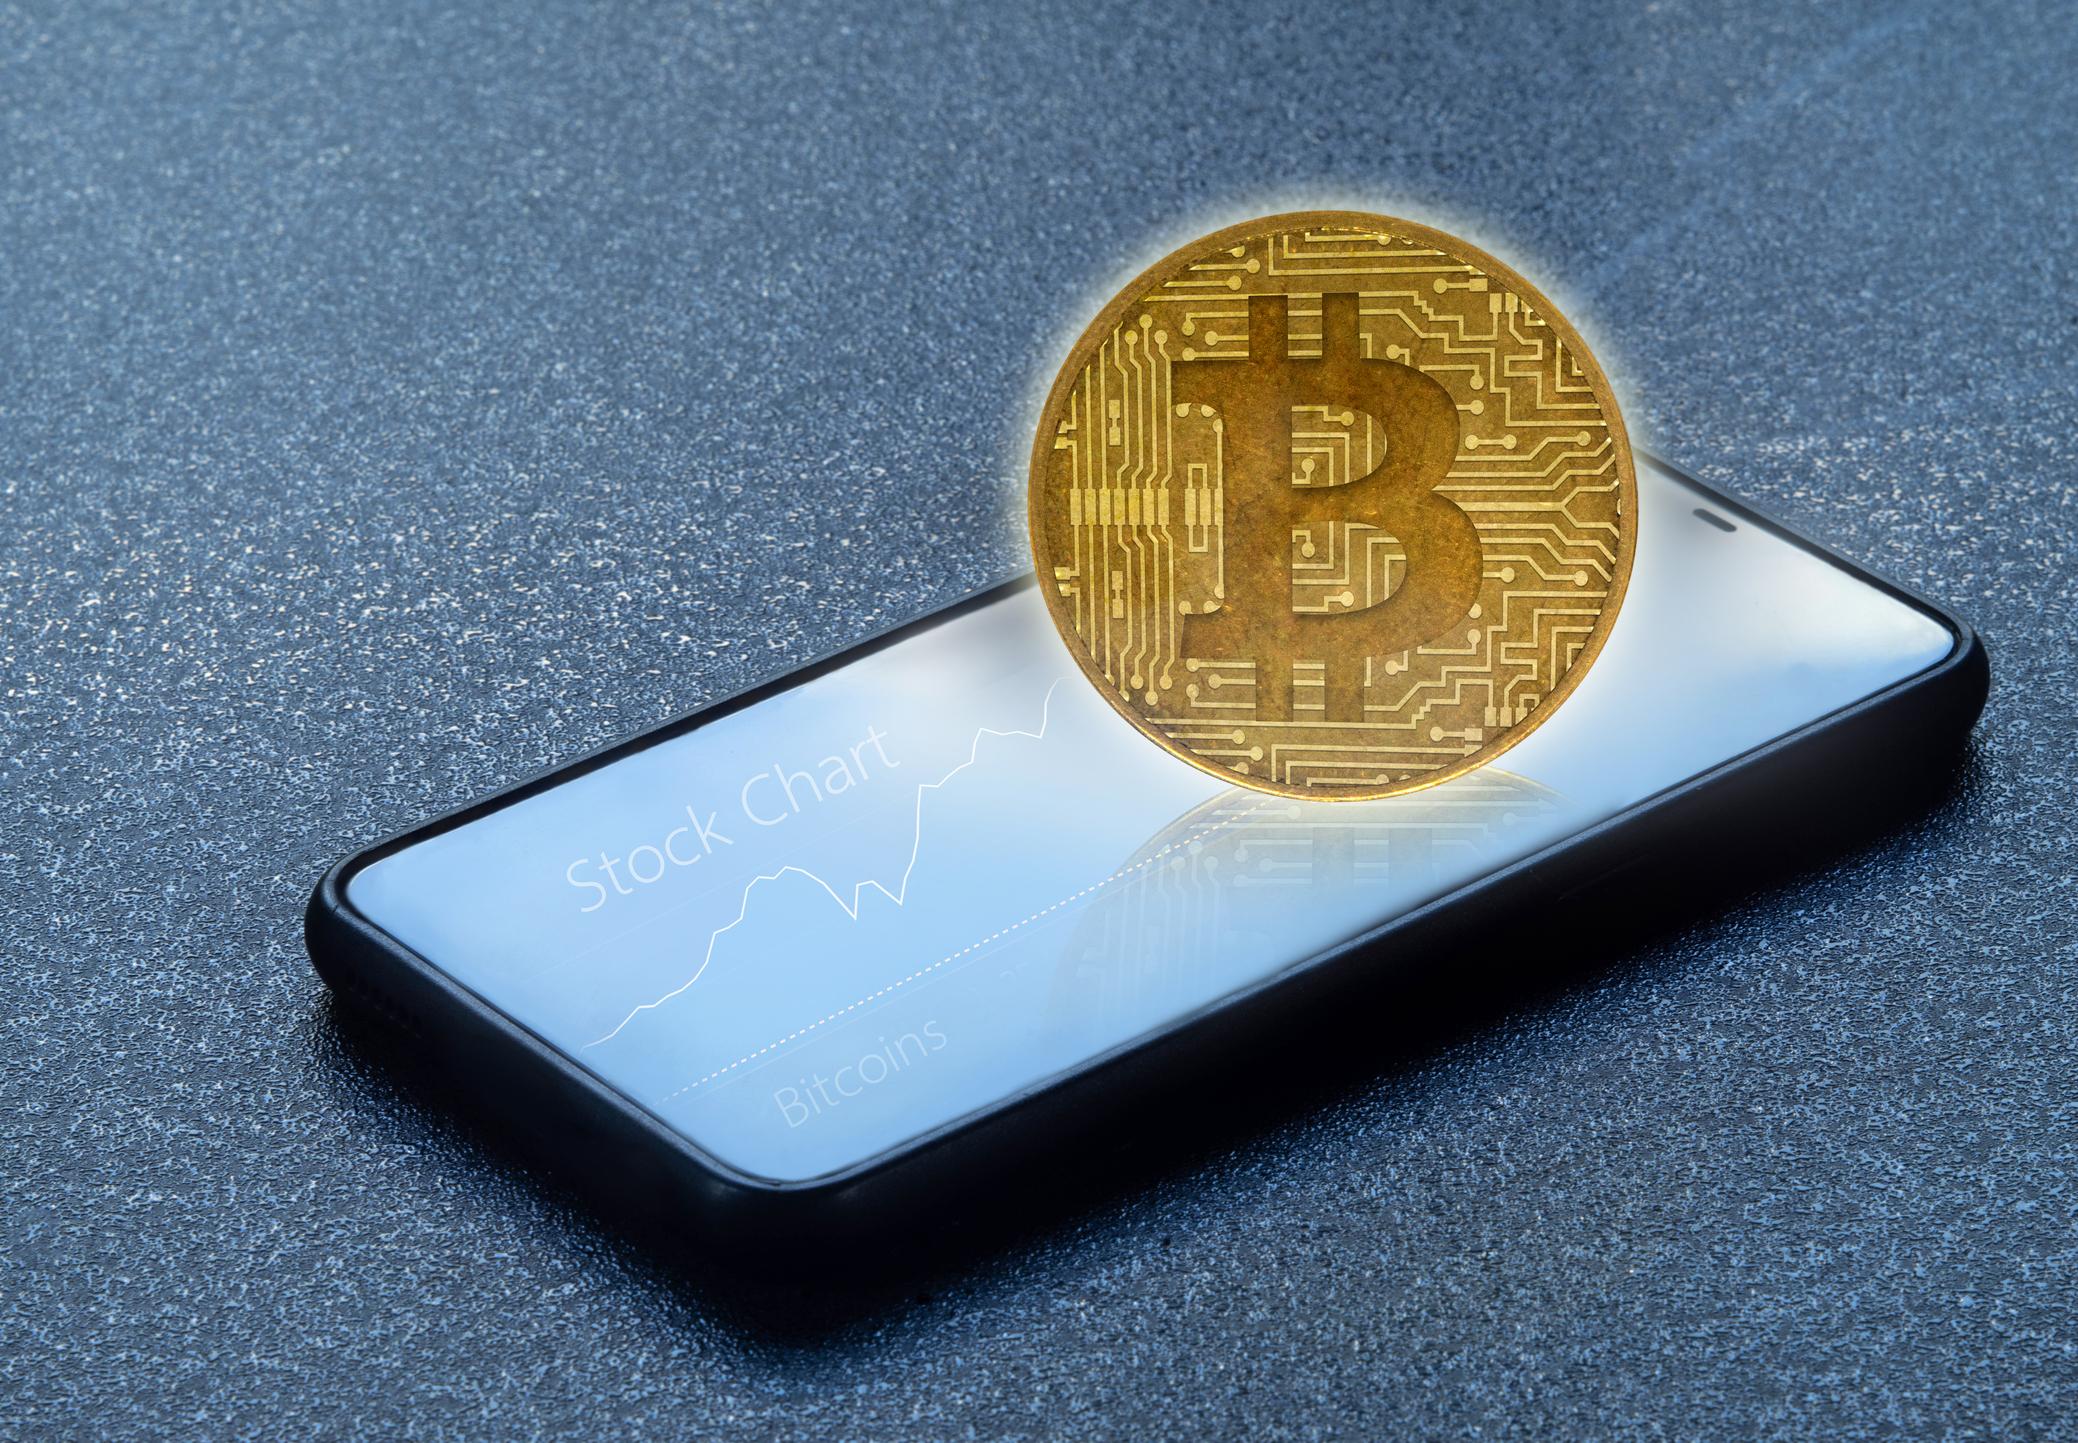 techcrunch.com - Sarah Perez - Jack Dorsey says bitcoin will be a big part of Twitter's future